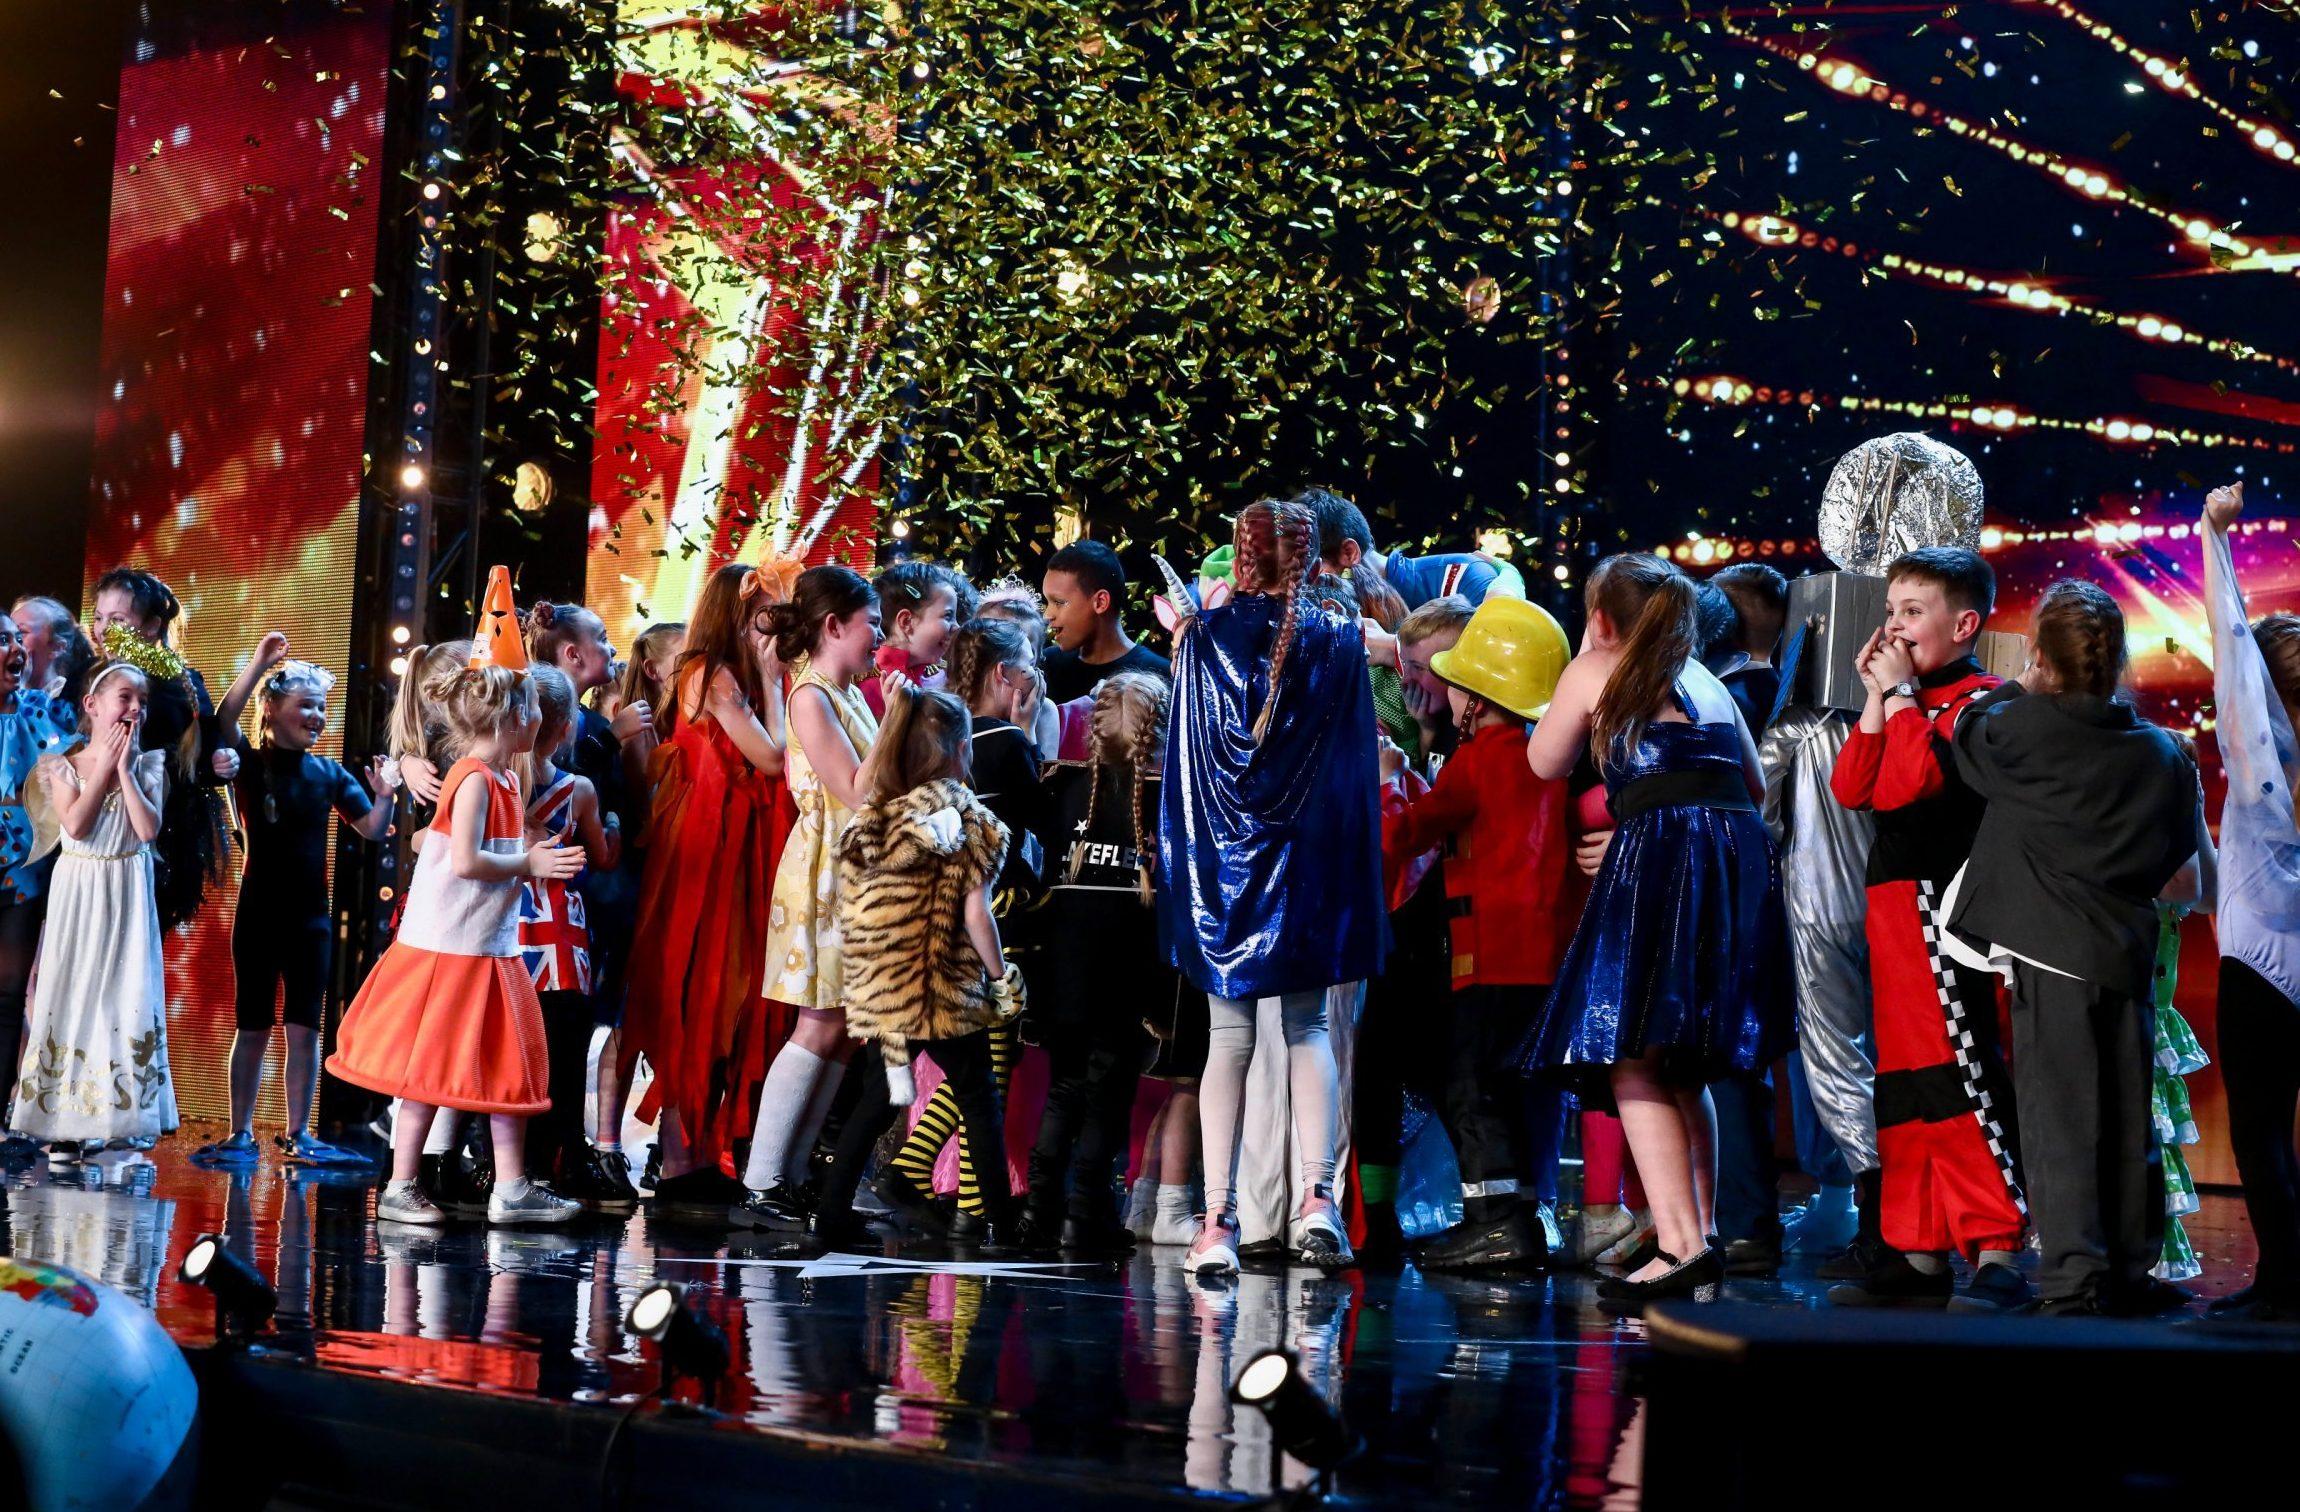 Britain's Got Talent 2019: Who are the Golden Buzzer acts so far?